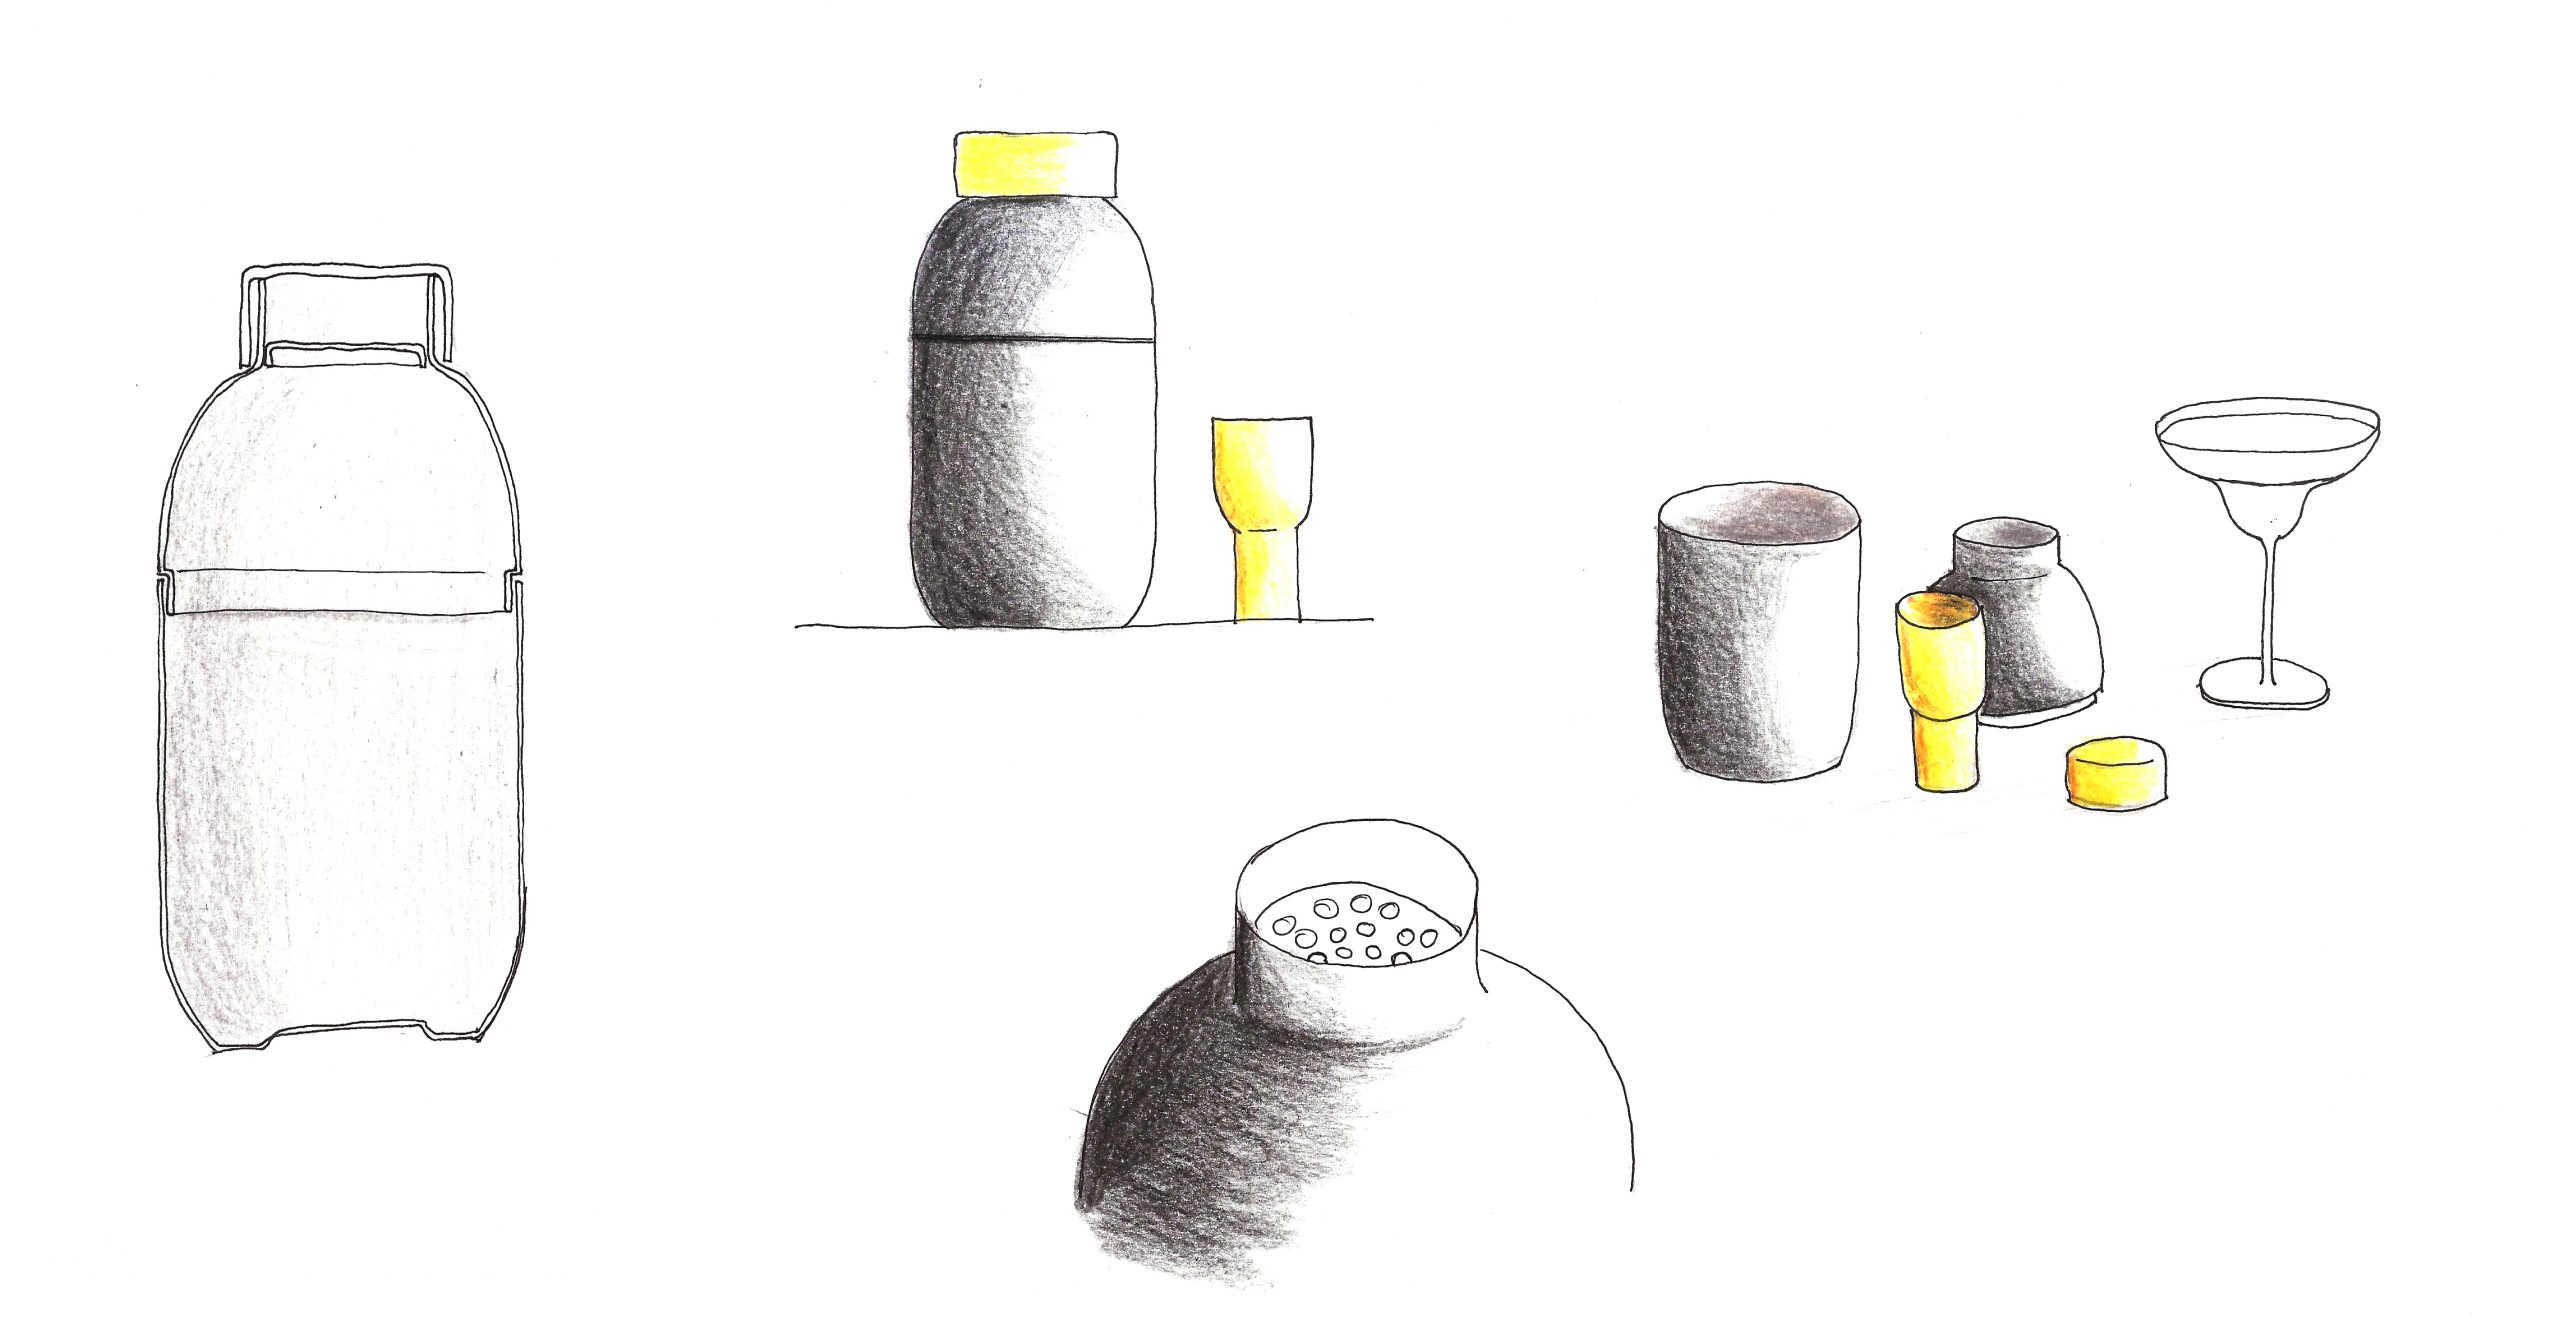 Sketch of the Collar bar set by Debiasi Sandri for Stelton